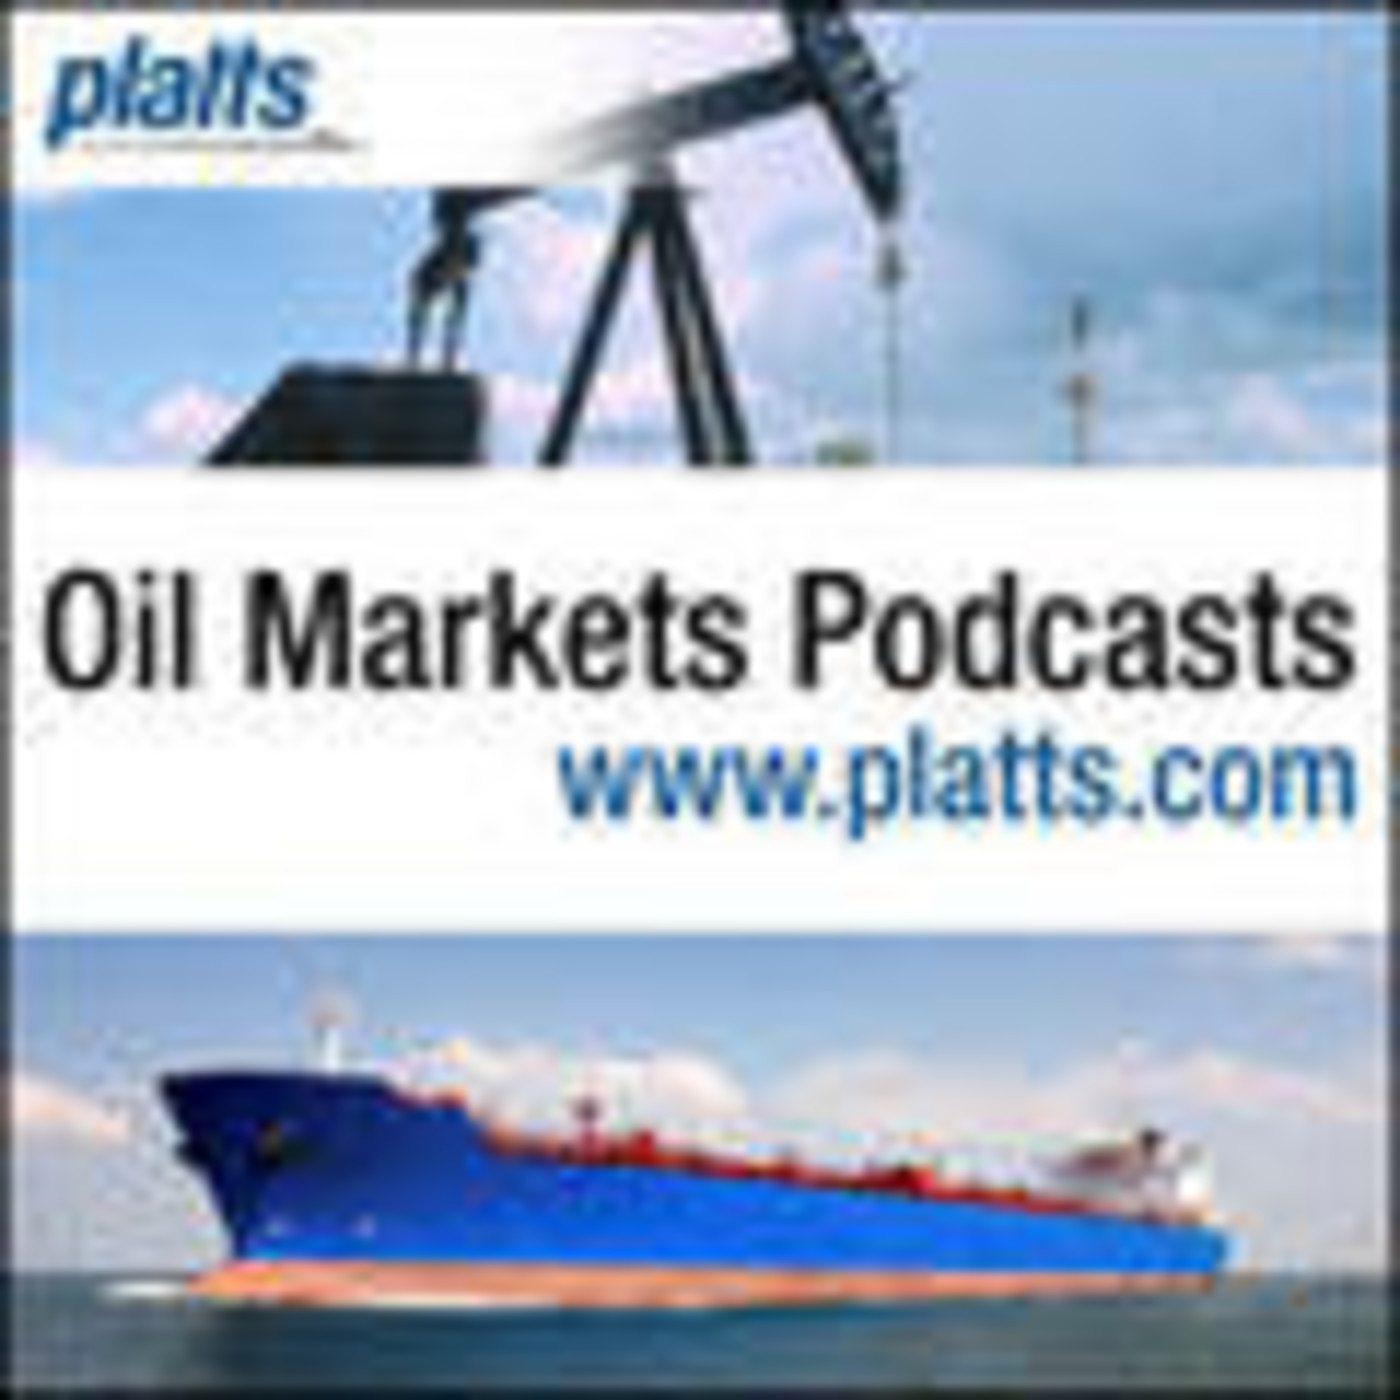 Platts Oil Markets Podcasts